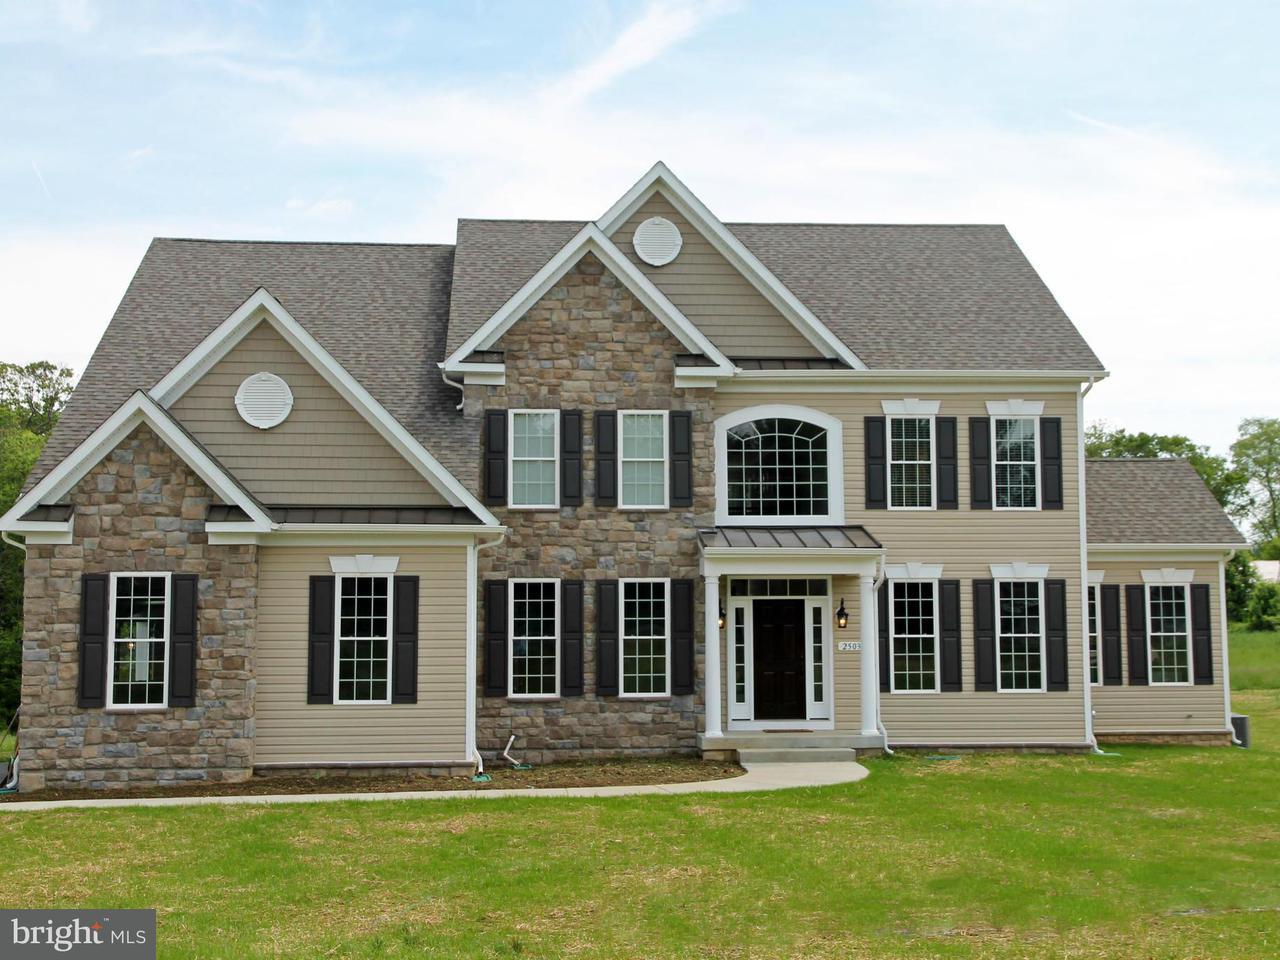 Vivienda unifamiliar por un Venta en 1912 PARKWOOD Drive 1912 PARKWOOD Drive Forest Hill, Maryland 21050 Estados Unidos